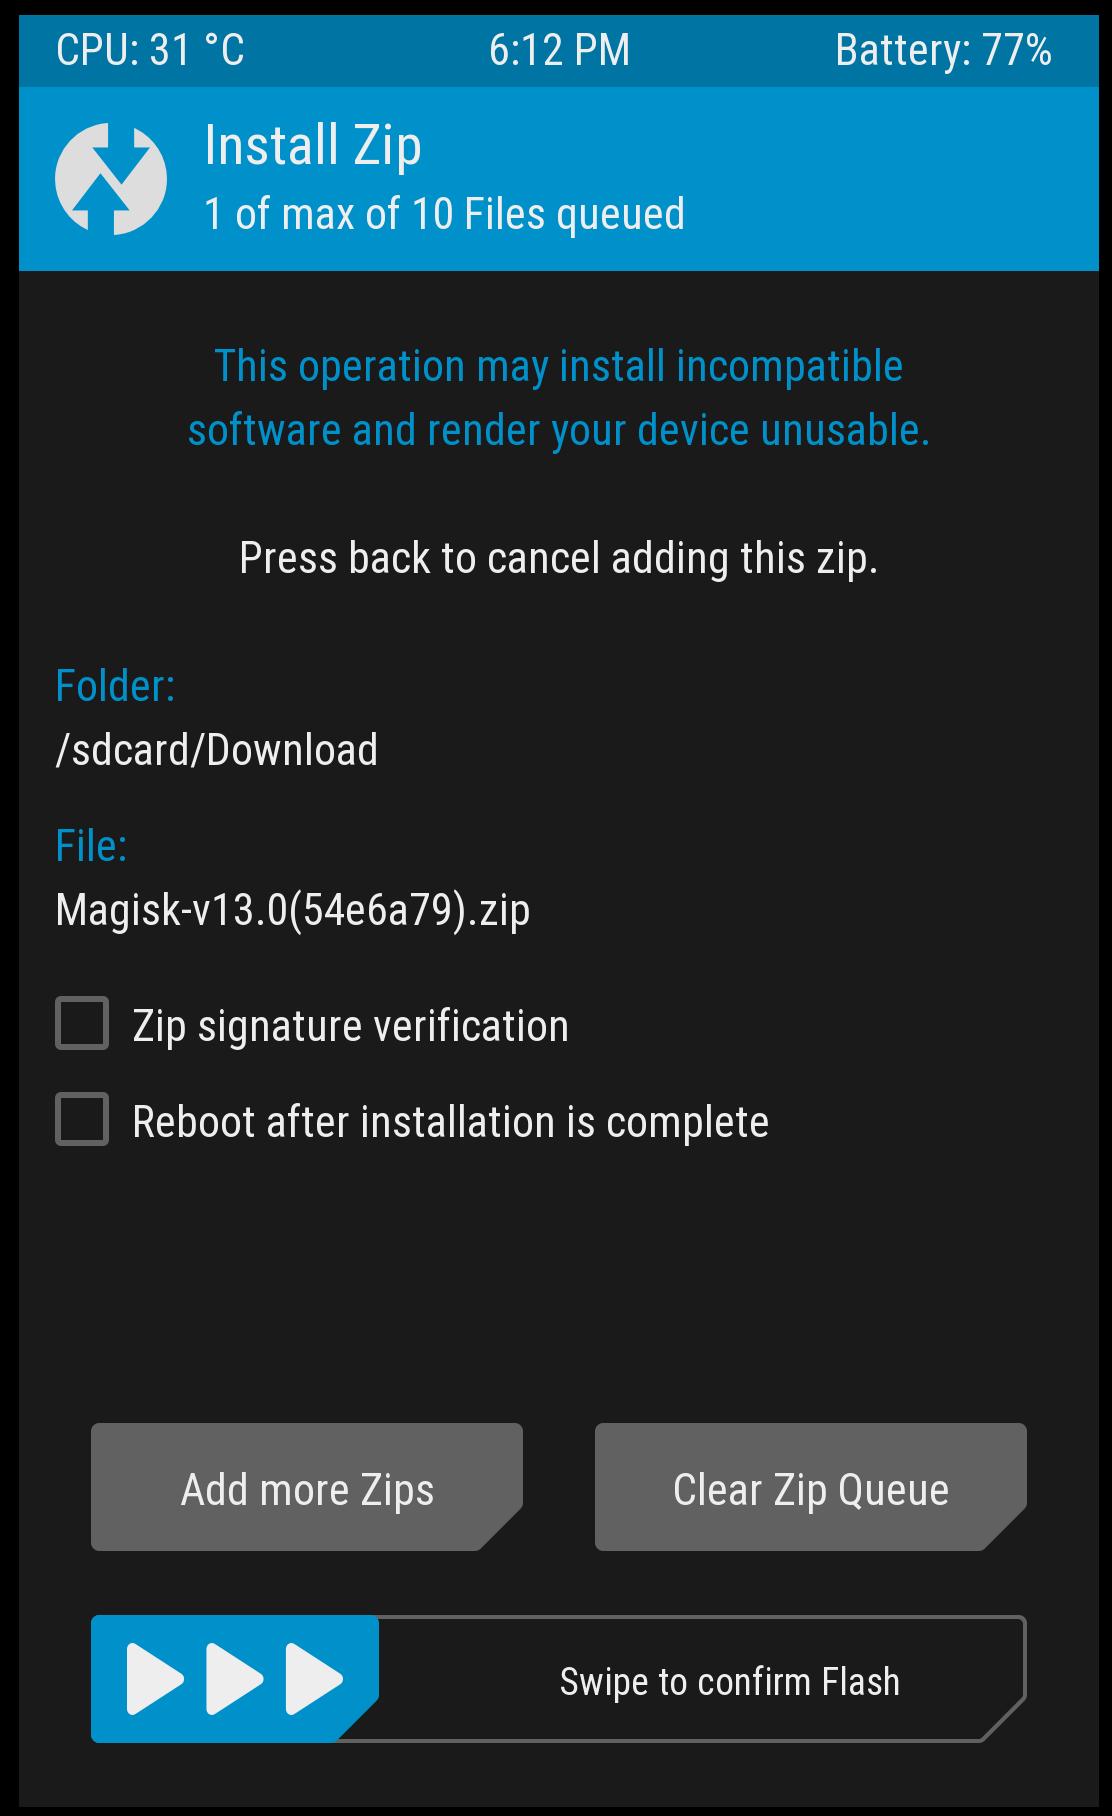 Installing Magisk on OnePlus 5